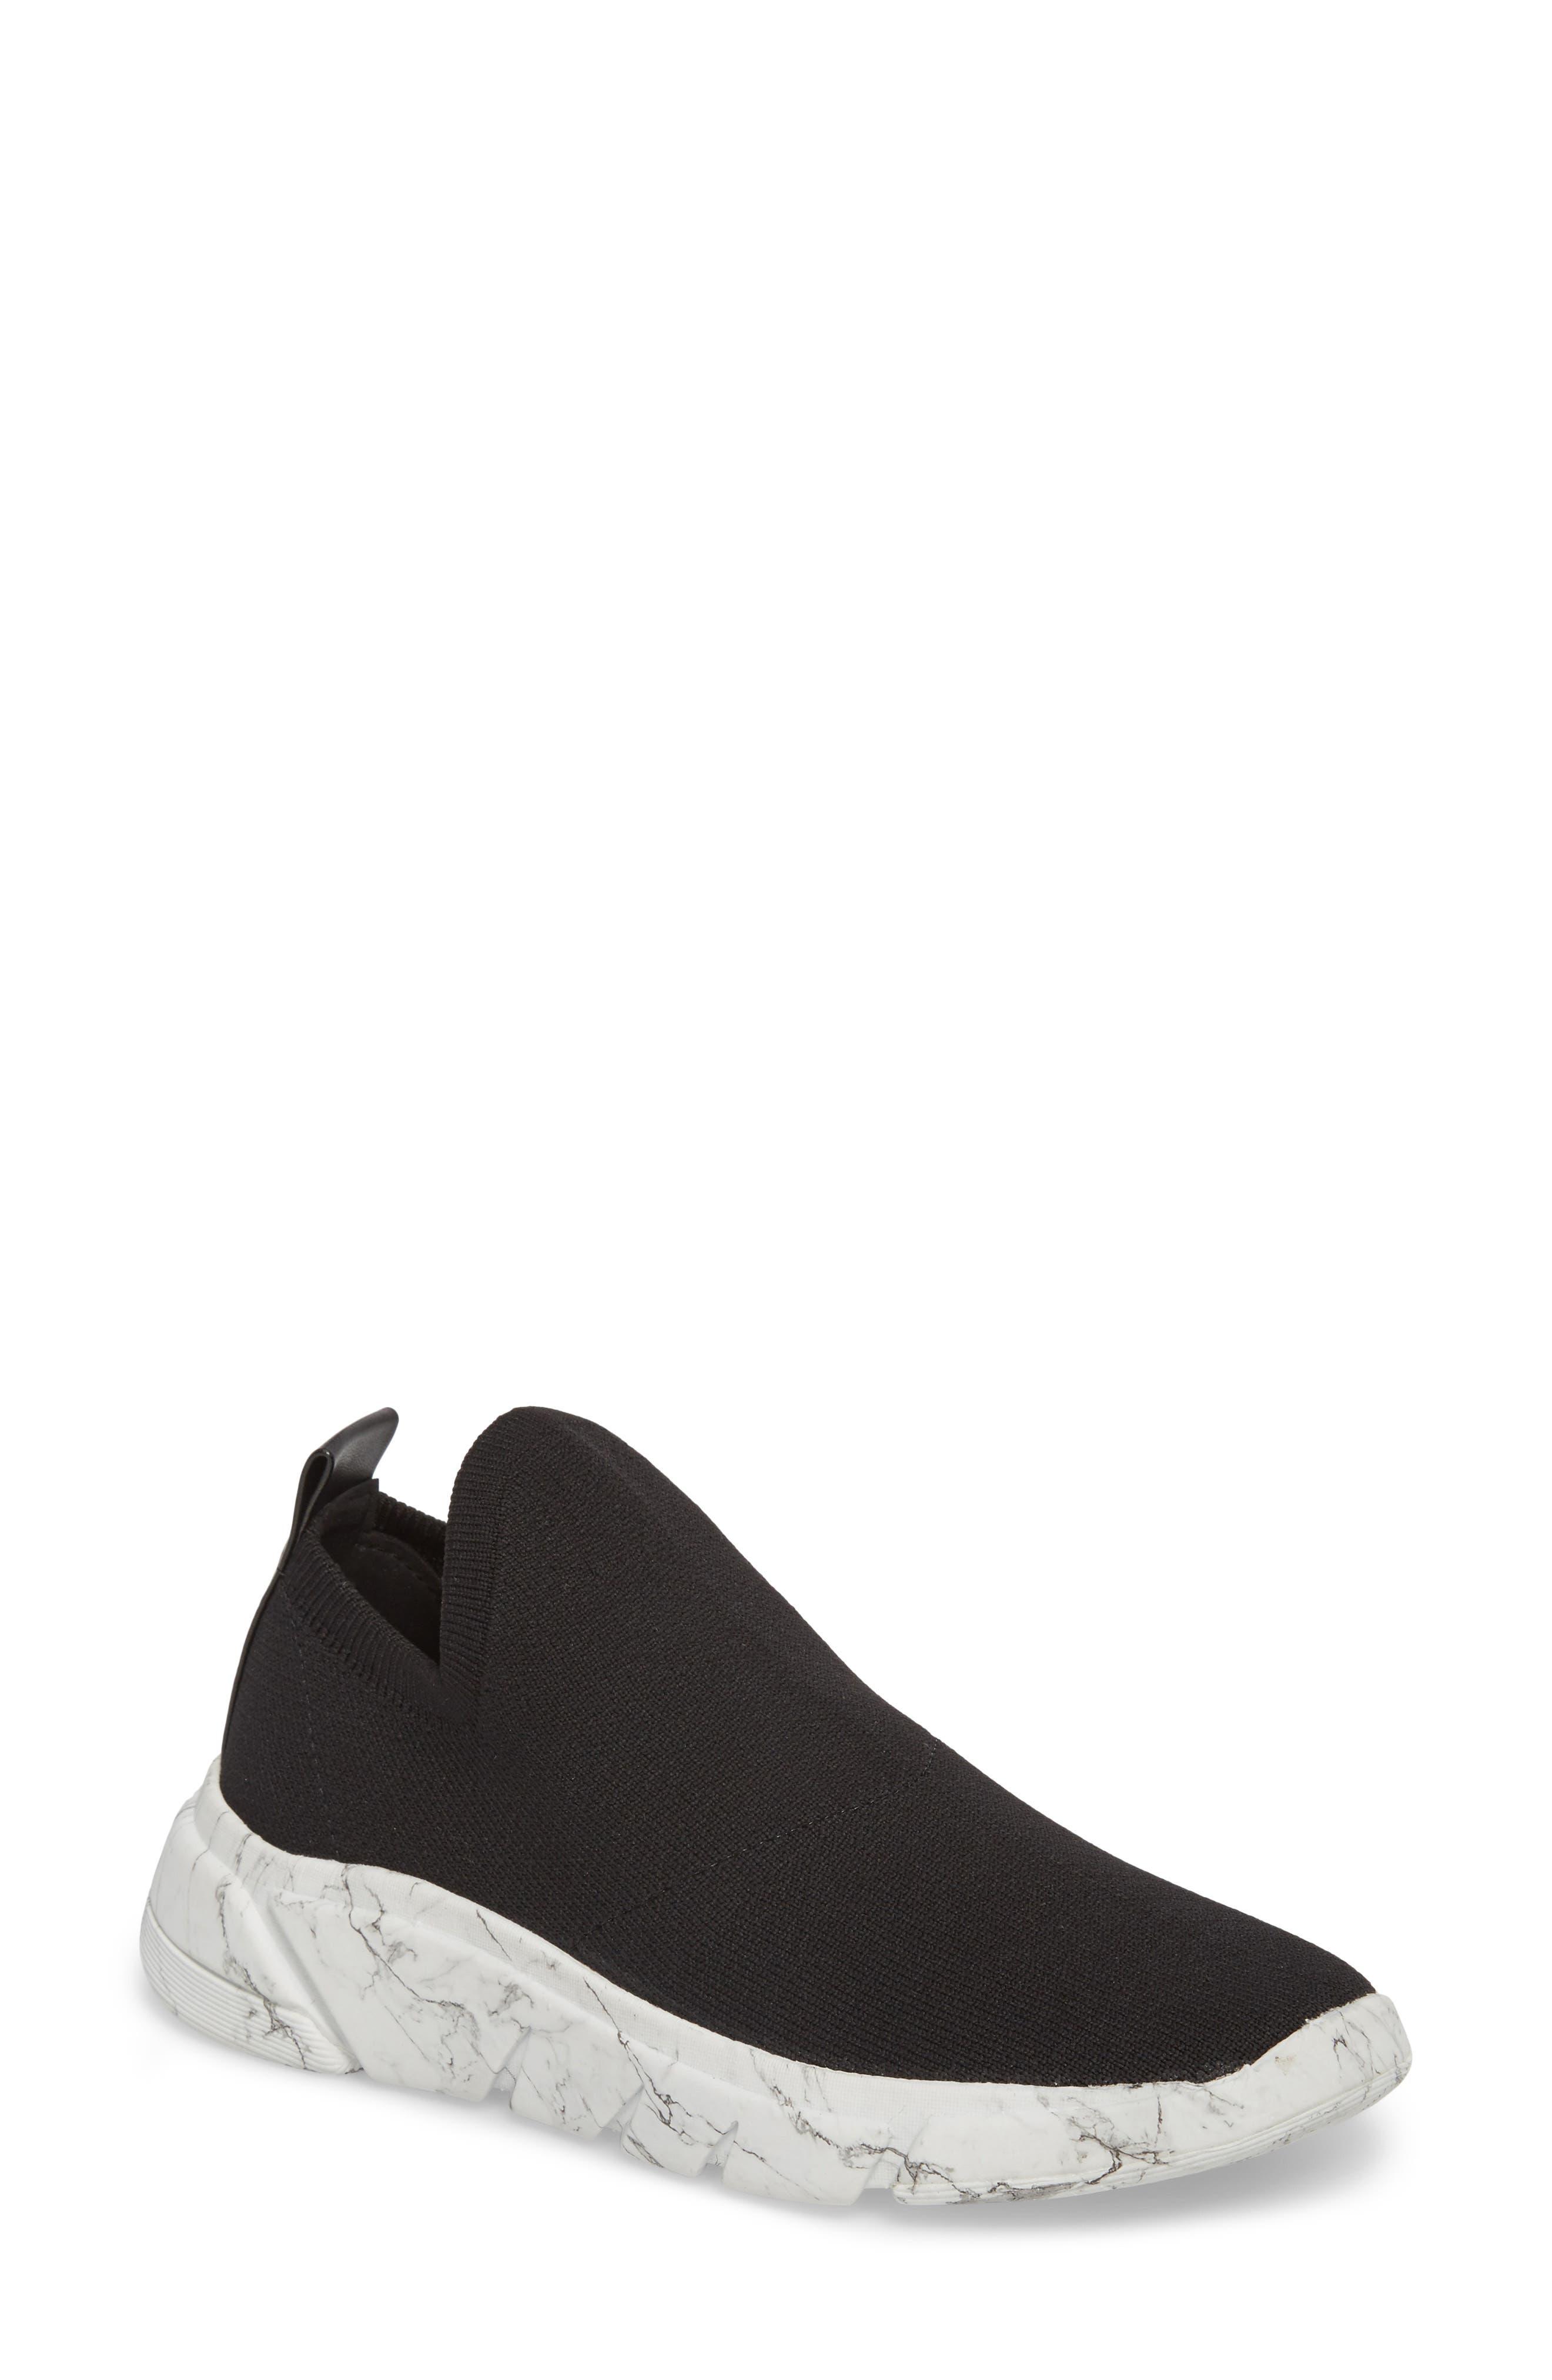 Caleb Knit Sneaker,                             Main thumbnail 1, color,                             BLACK